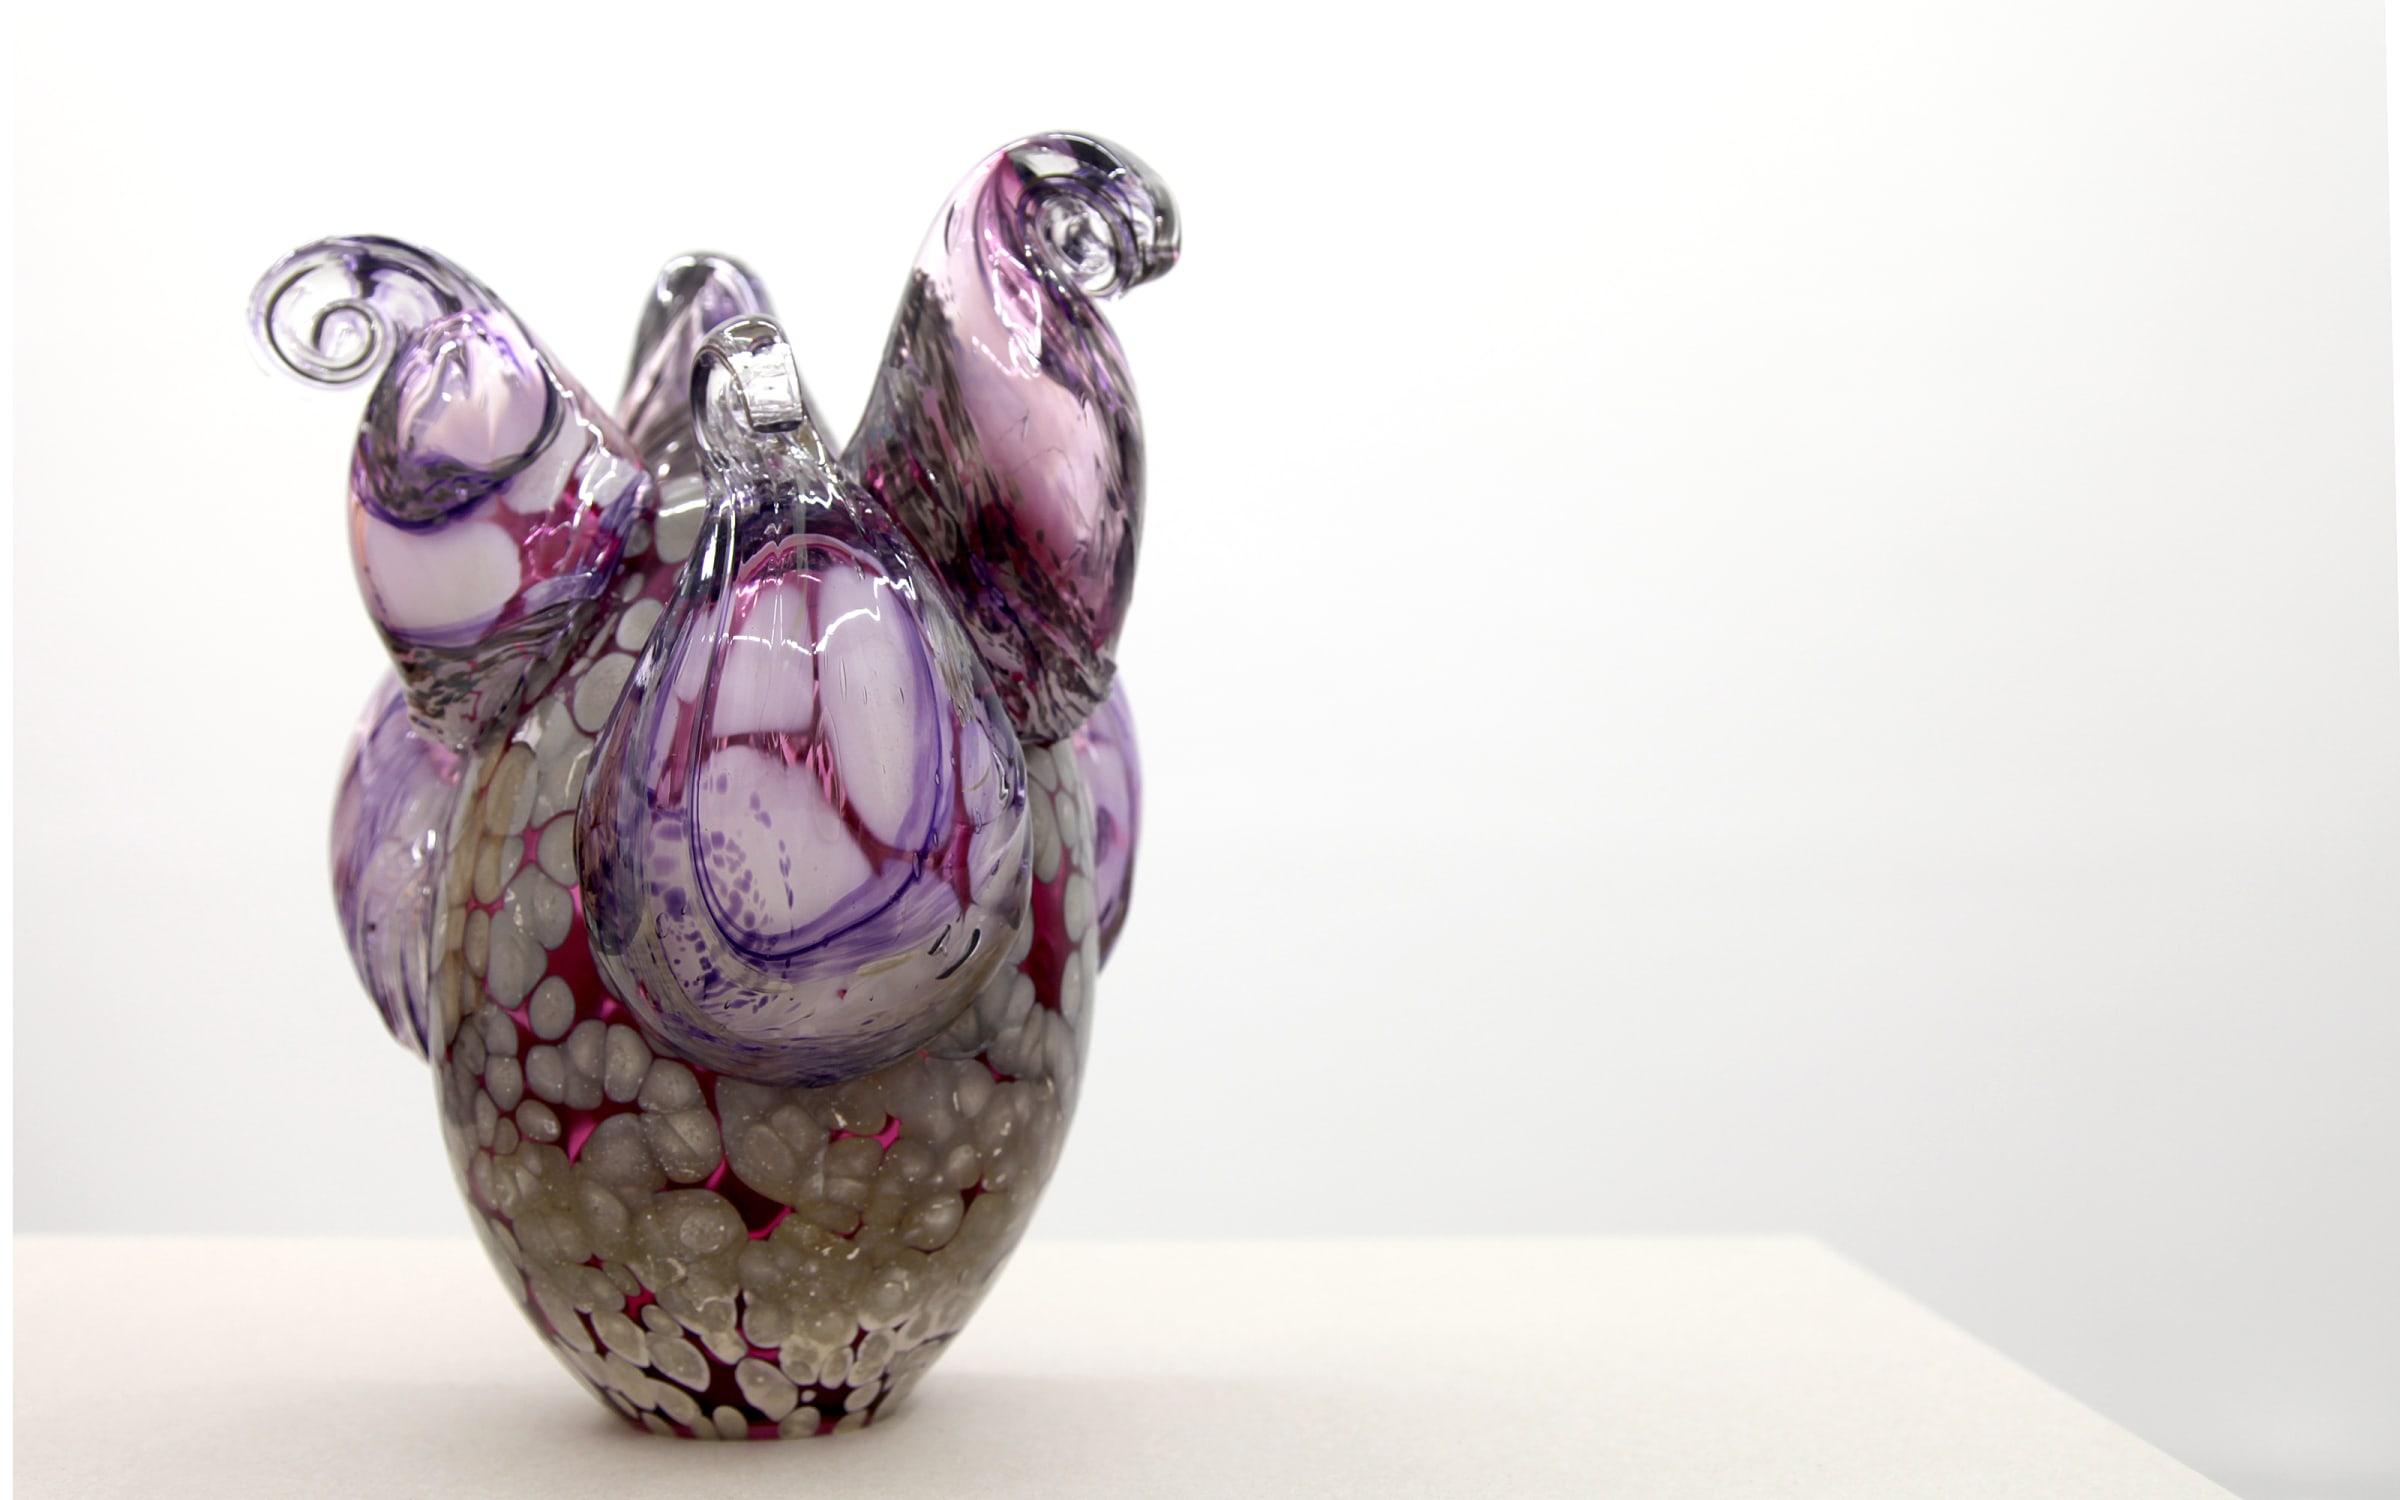 "<span class=""link fancybox-details-link""><a href=""/exhibitions/166/works/artworks15315/"">View Detail Page</a></span><div class=""artist""><strong>Kelly Akashi</strong></div><div class=""title""><em>Curled Lifeform</em>, 2018</div><div class=""medium"">blown glass</div><div class=""dimensions"">35,5 x 23 x 23 cm<br></div>"